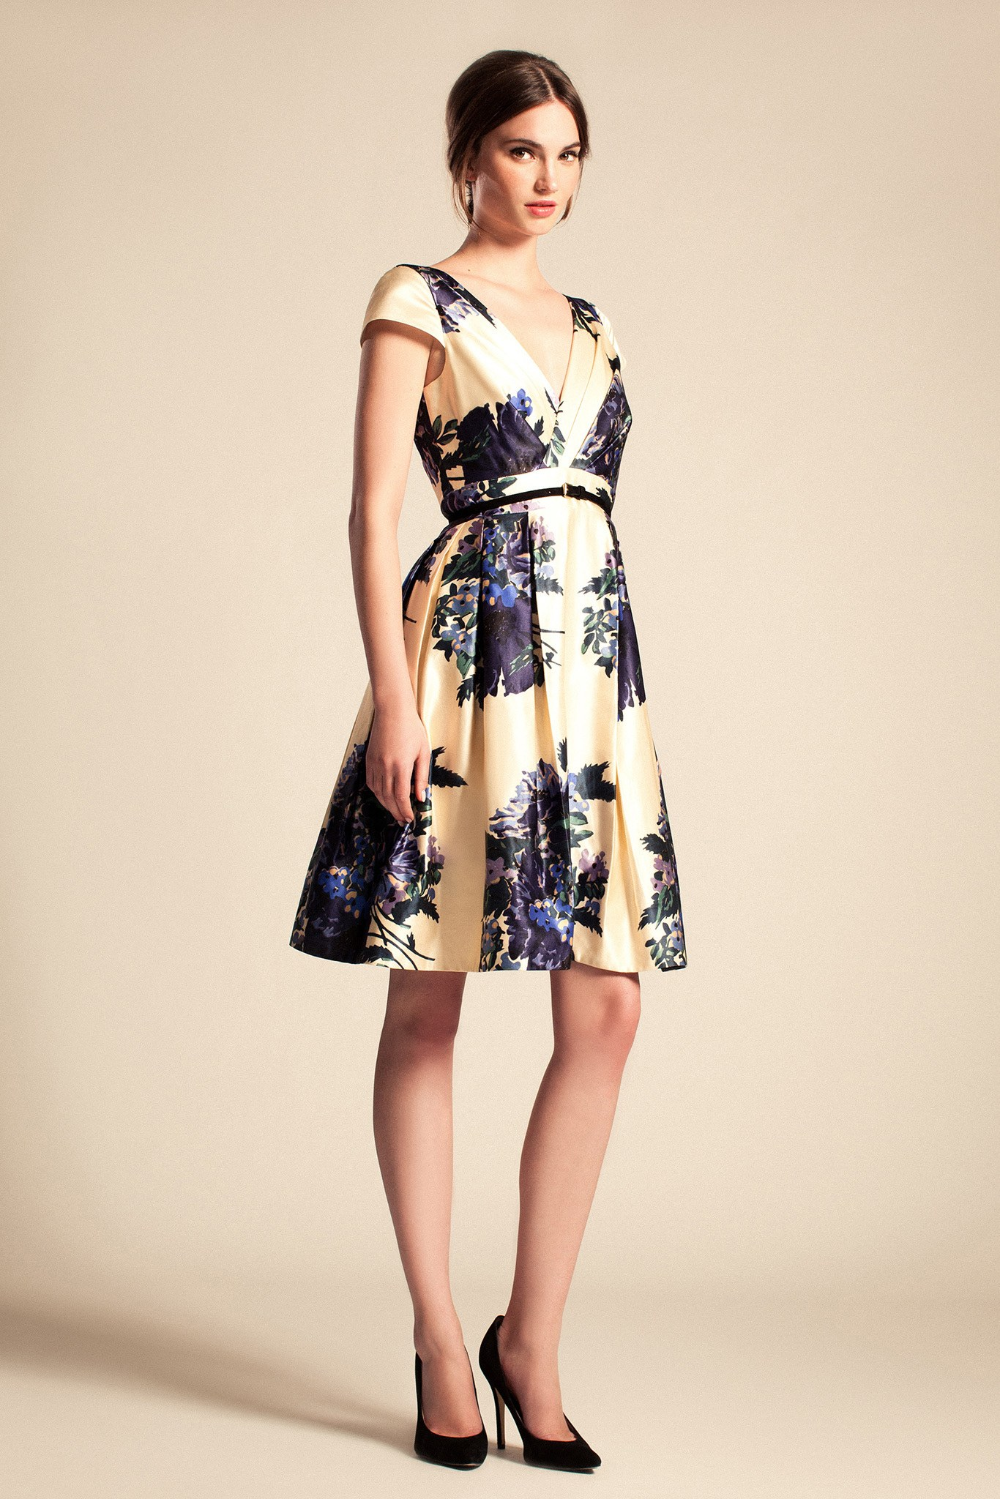 Temperley London Resort 2014 Fashion Show